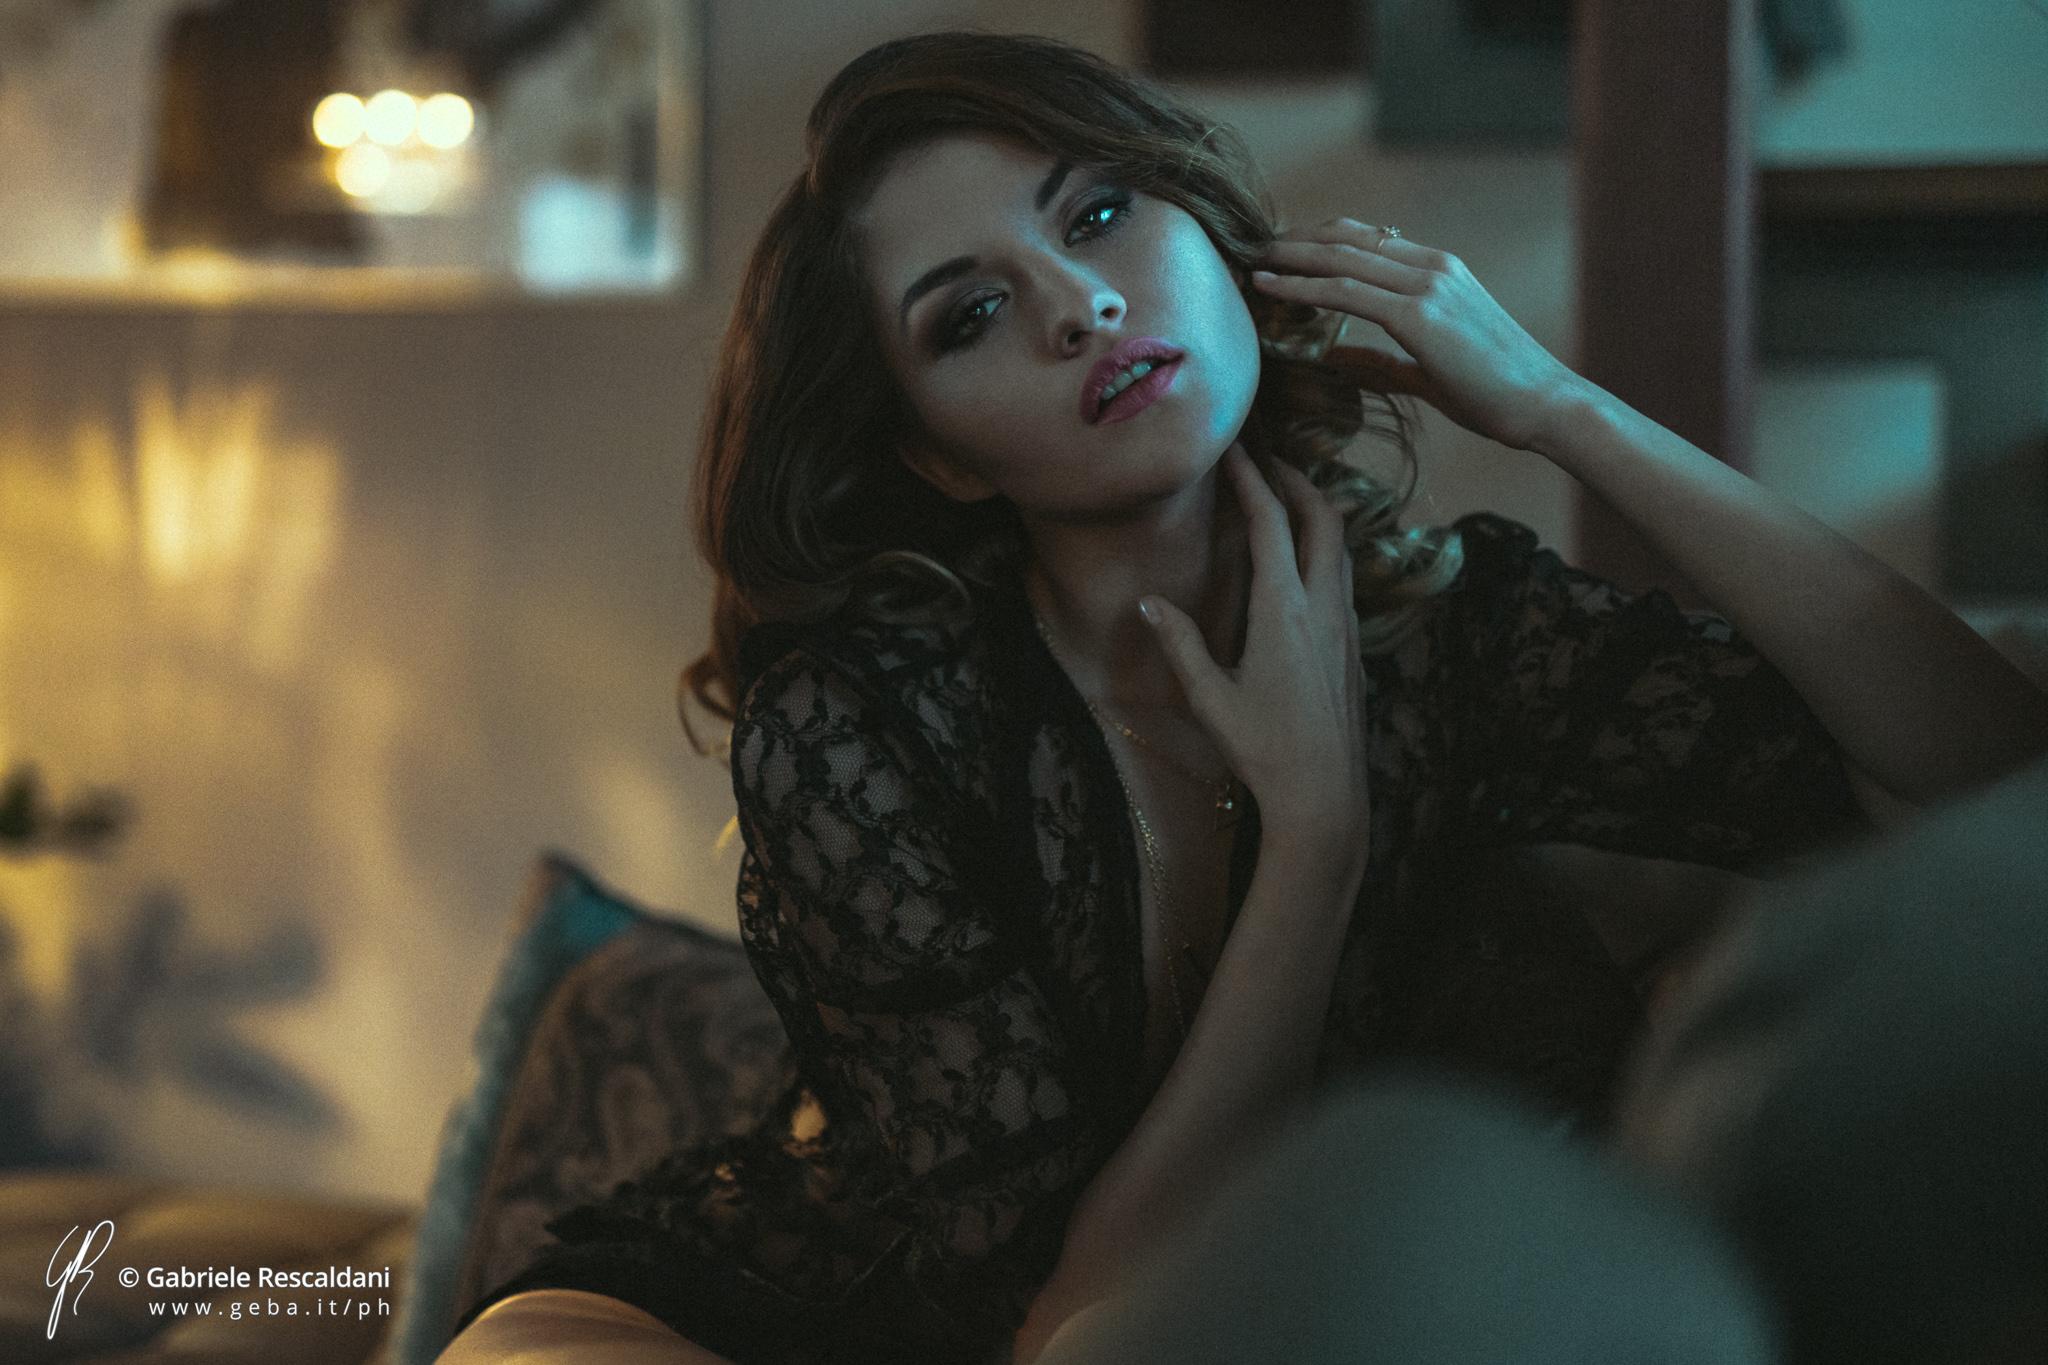 Между светом и тенью - Aleksandra Graczyk / Gabriele Rescaldani